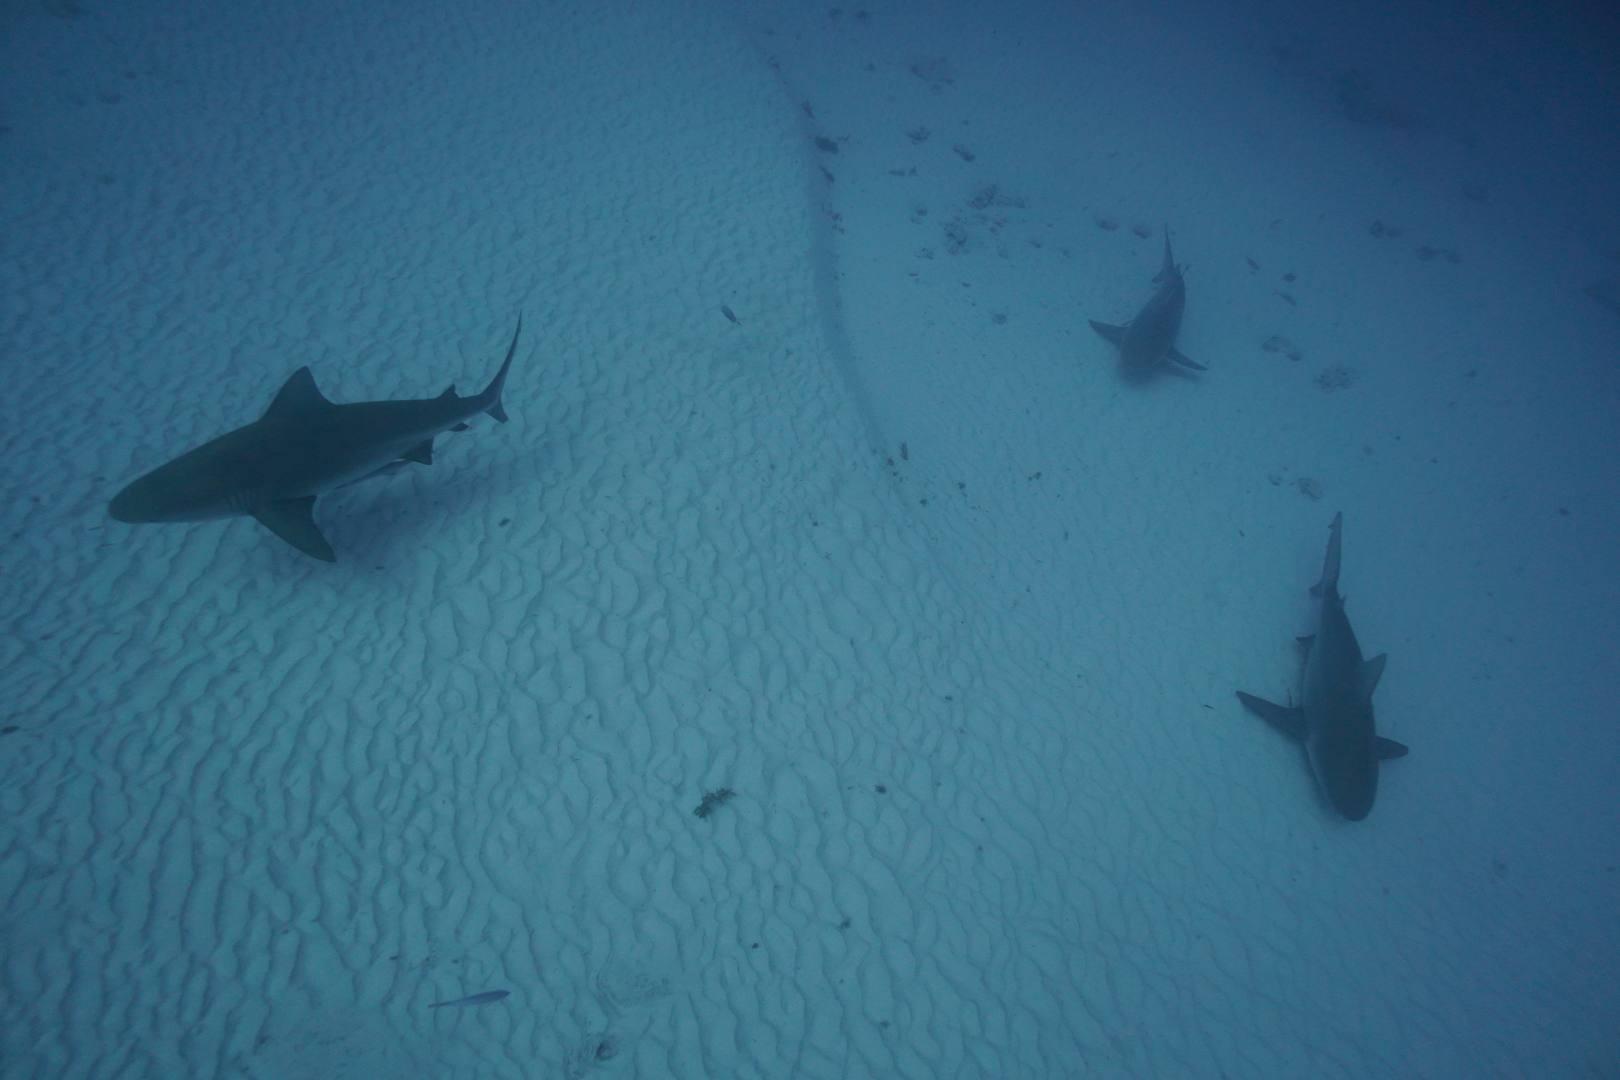 Bull shark encounter